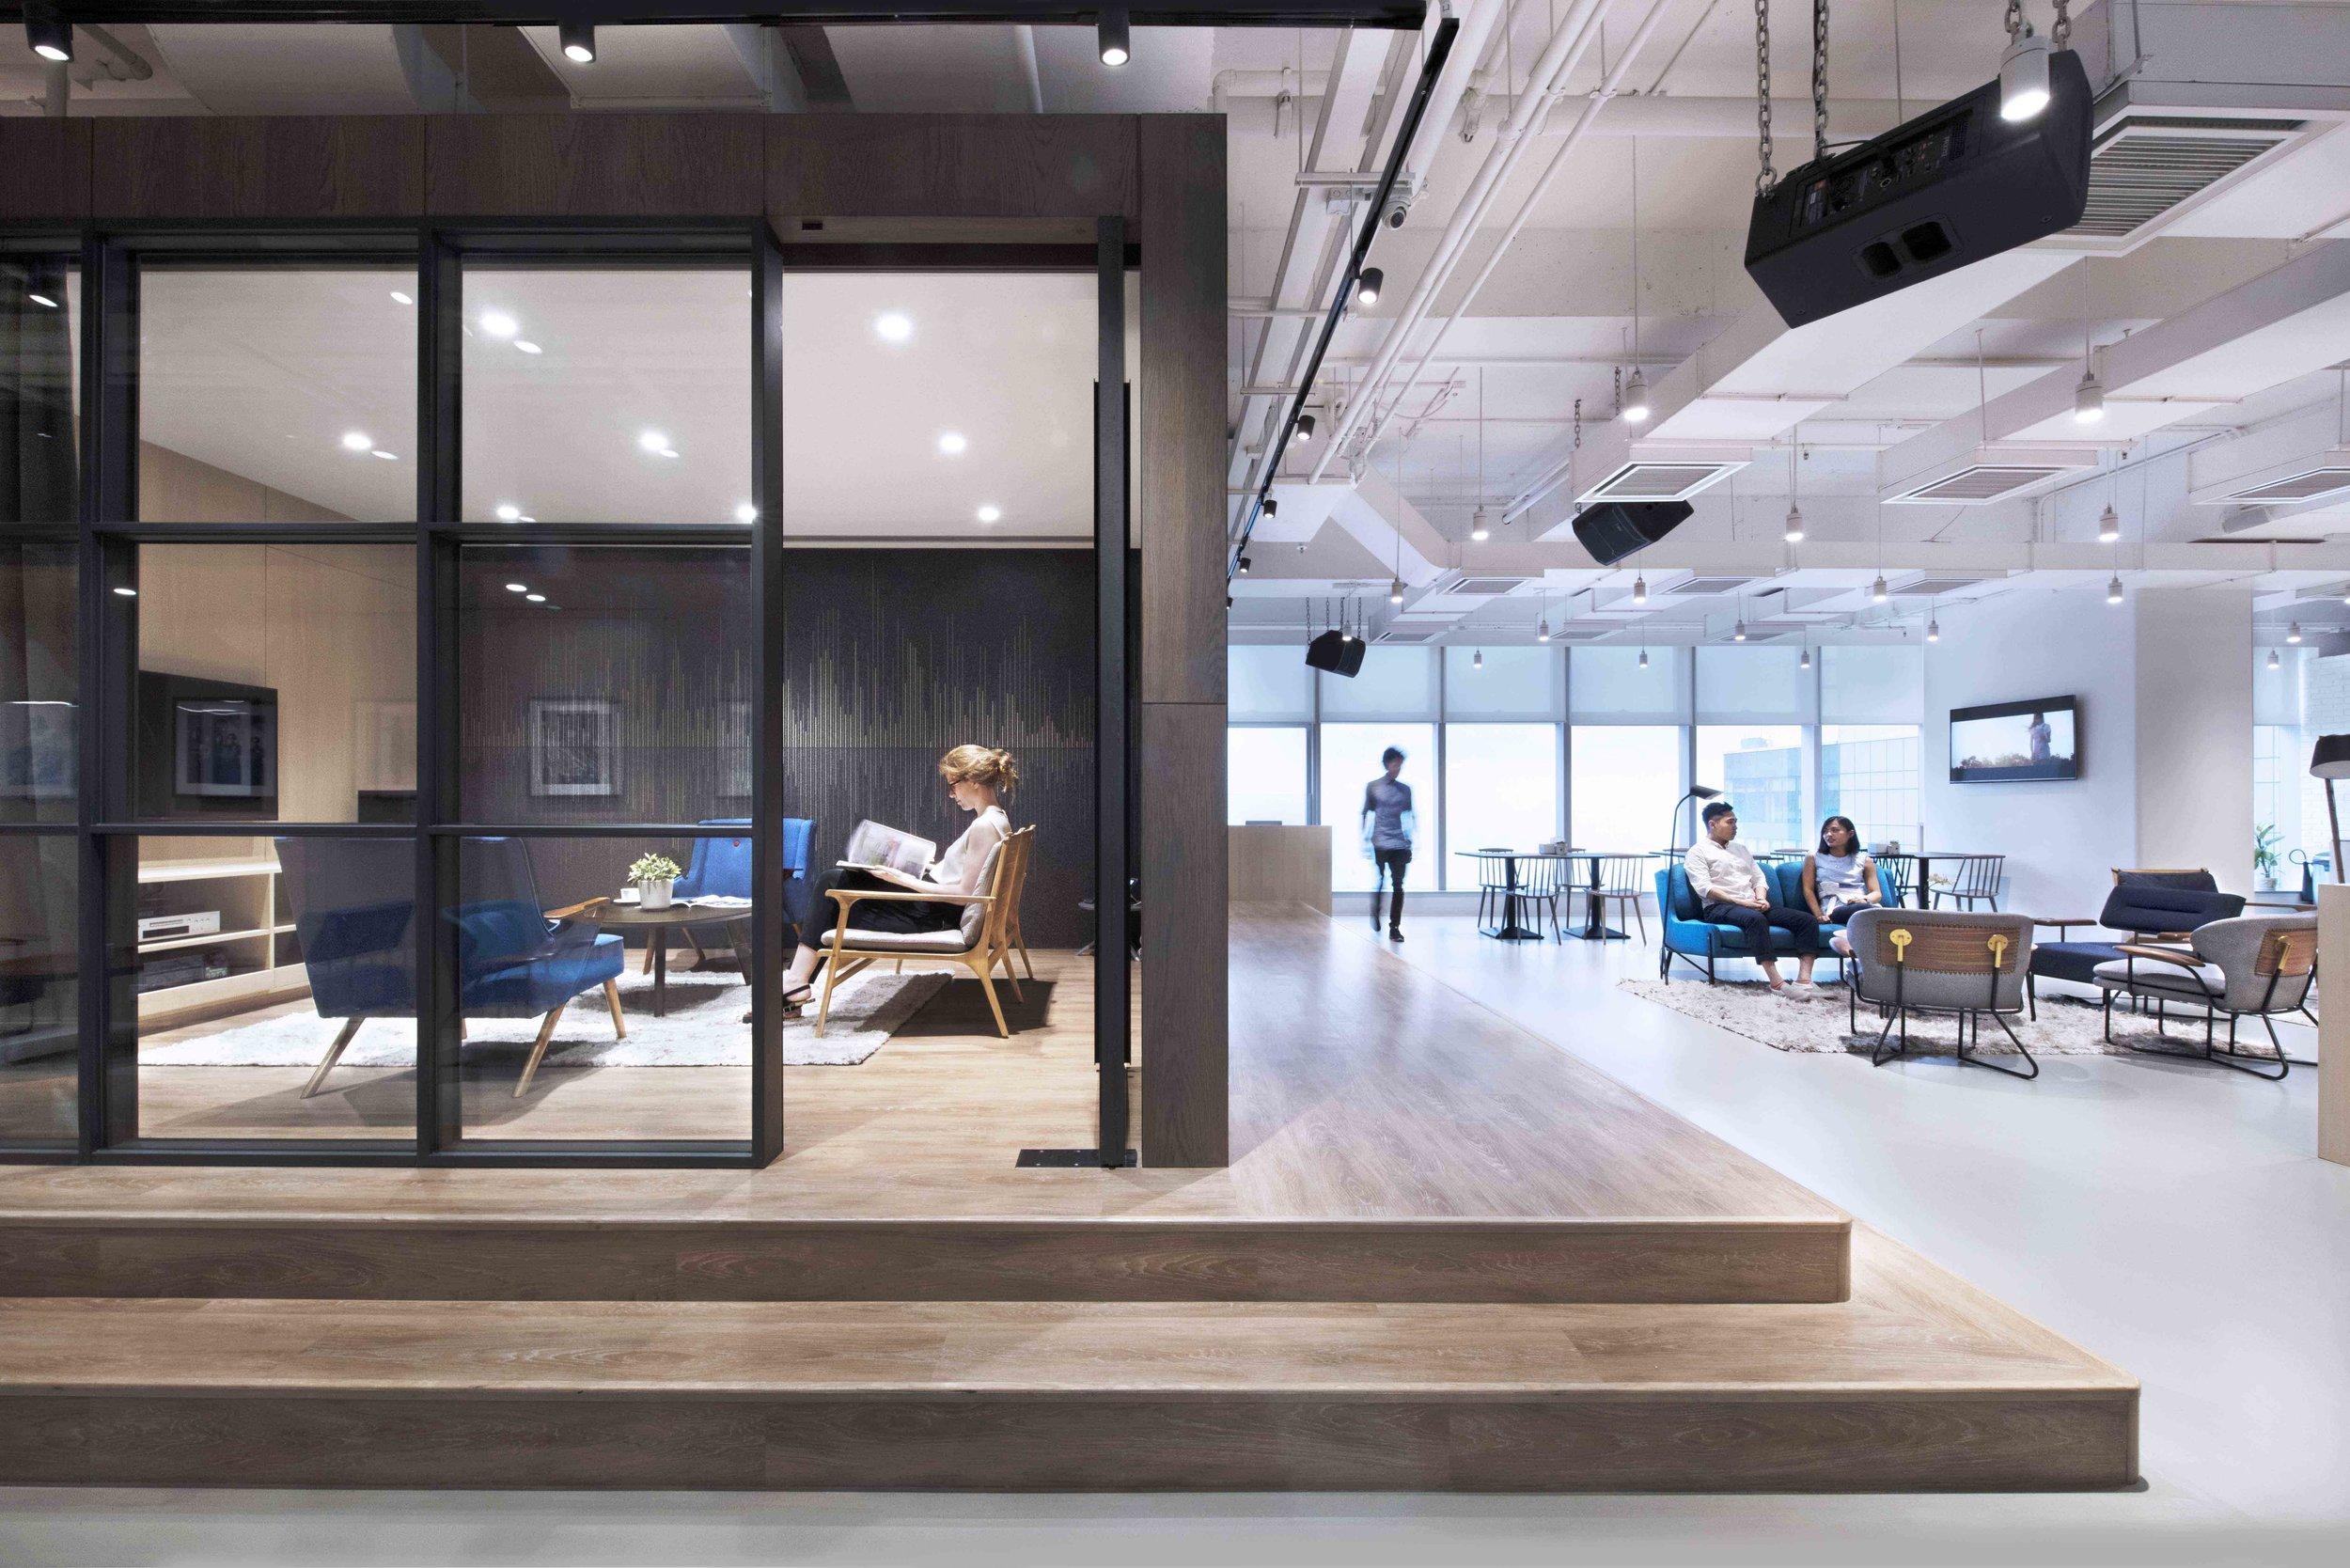 02_Bean Buro_Office Workplace_Kwung Tong_Warner Music Hong Kong_1_1.jpg